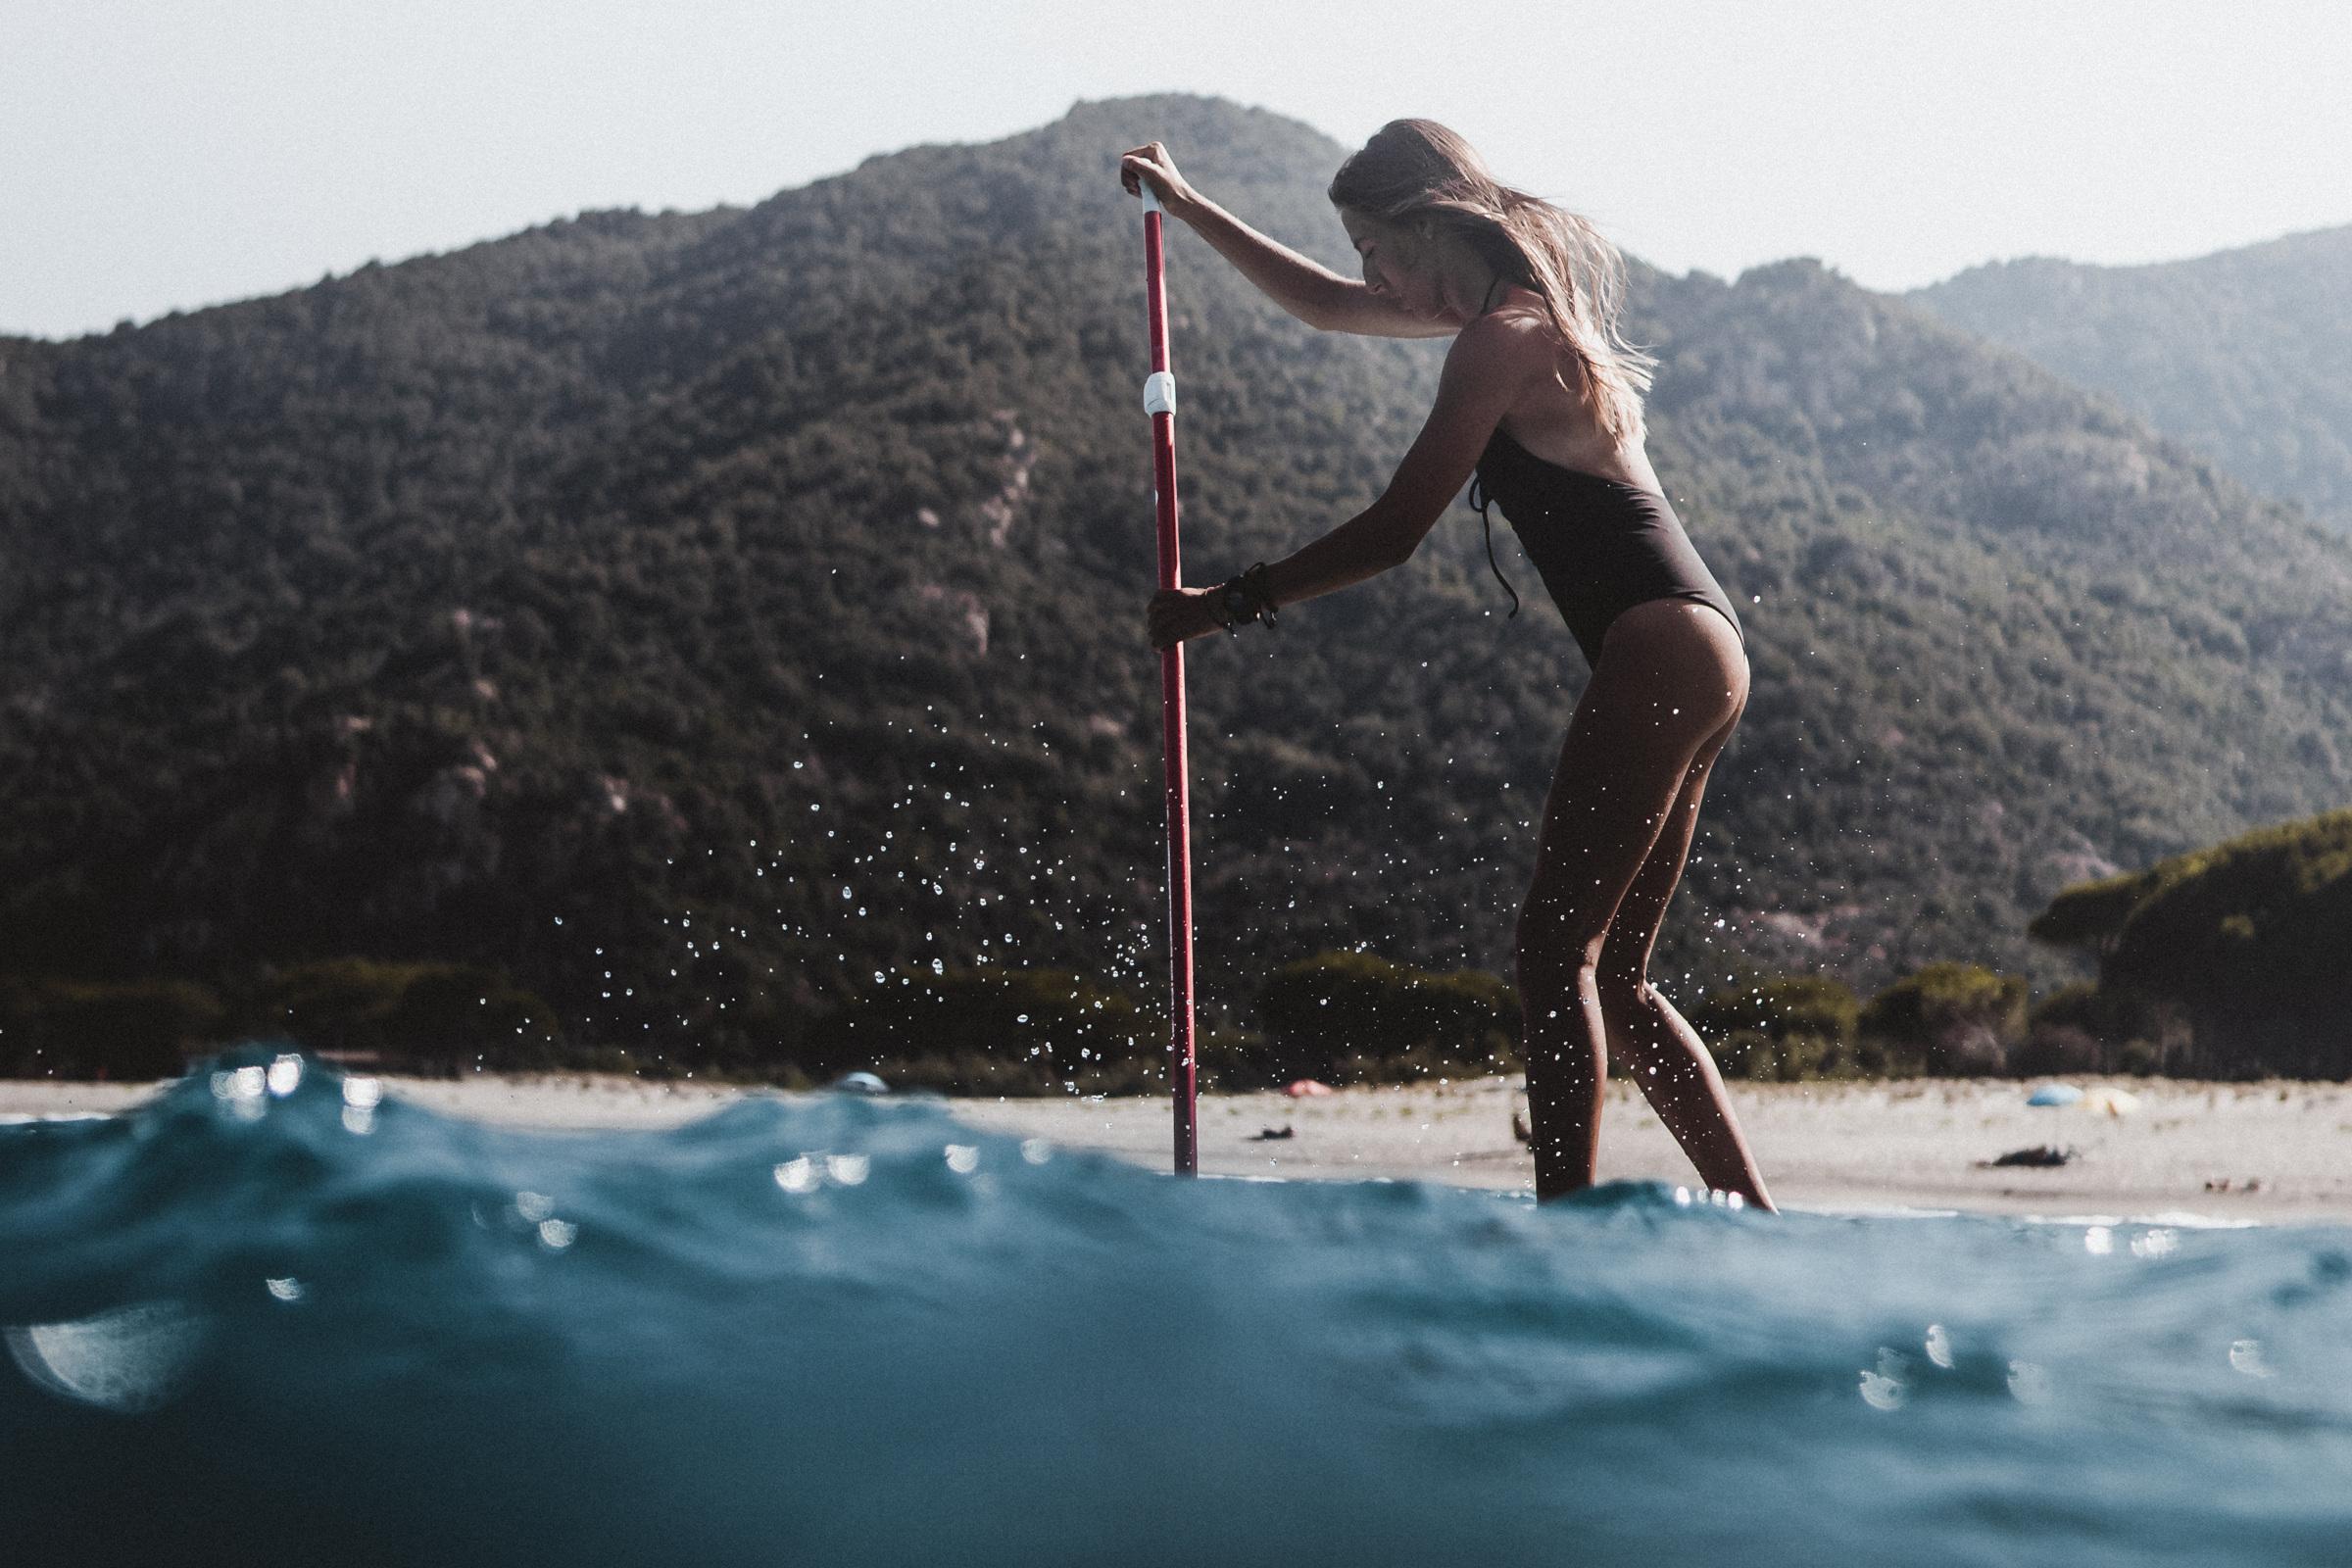 Sardegna - summer 2018 - Spending the summer in this beautiful island.